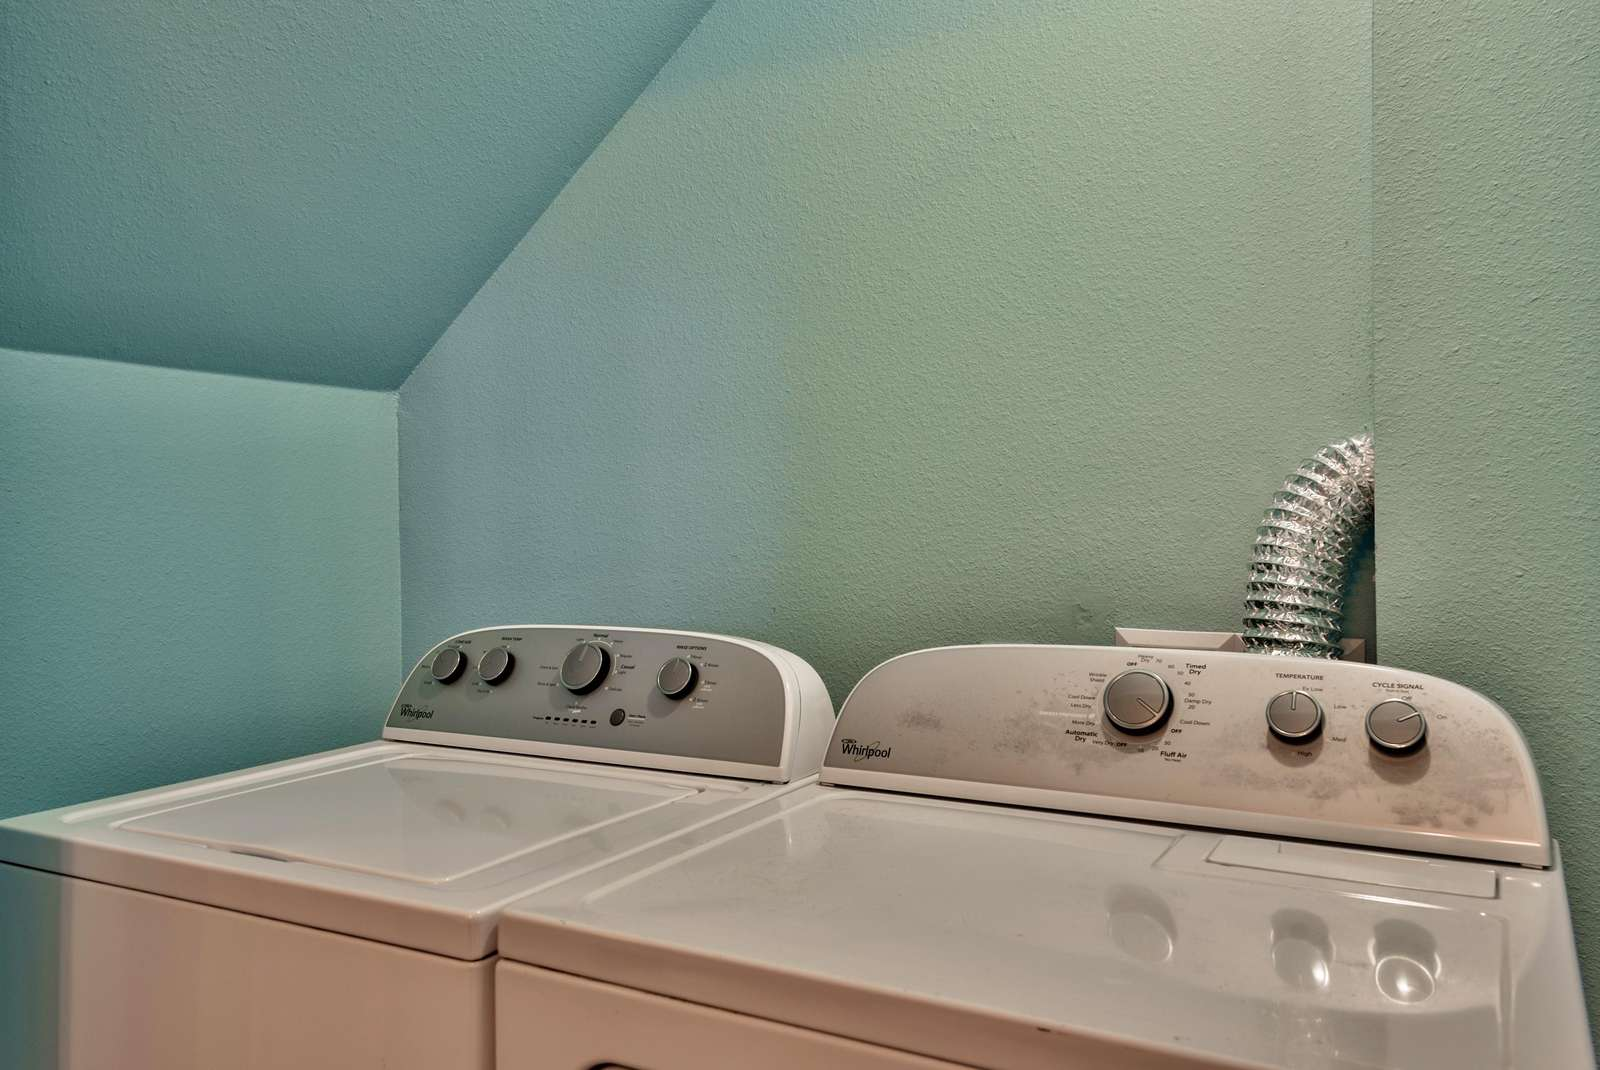 Wasdher / Dryer